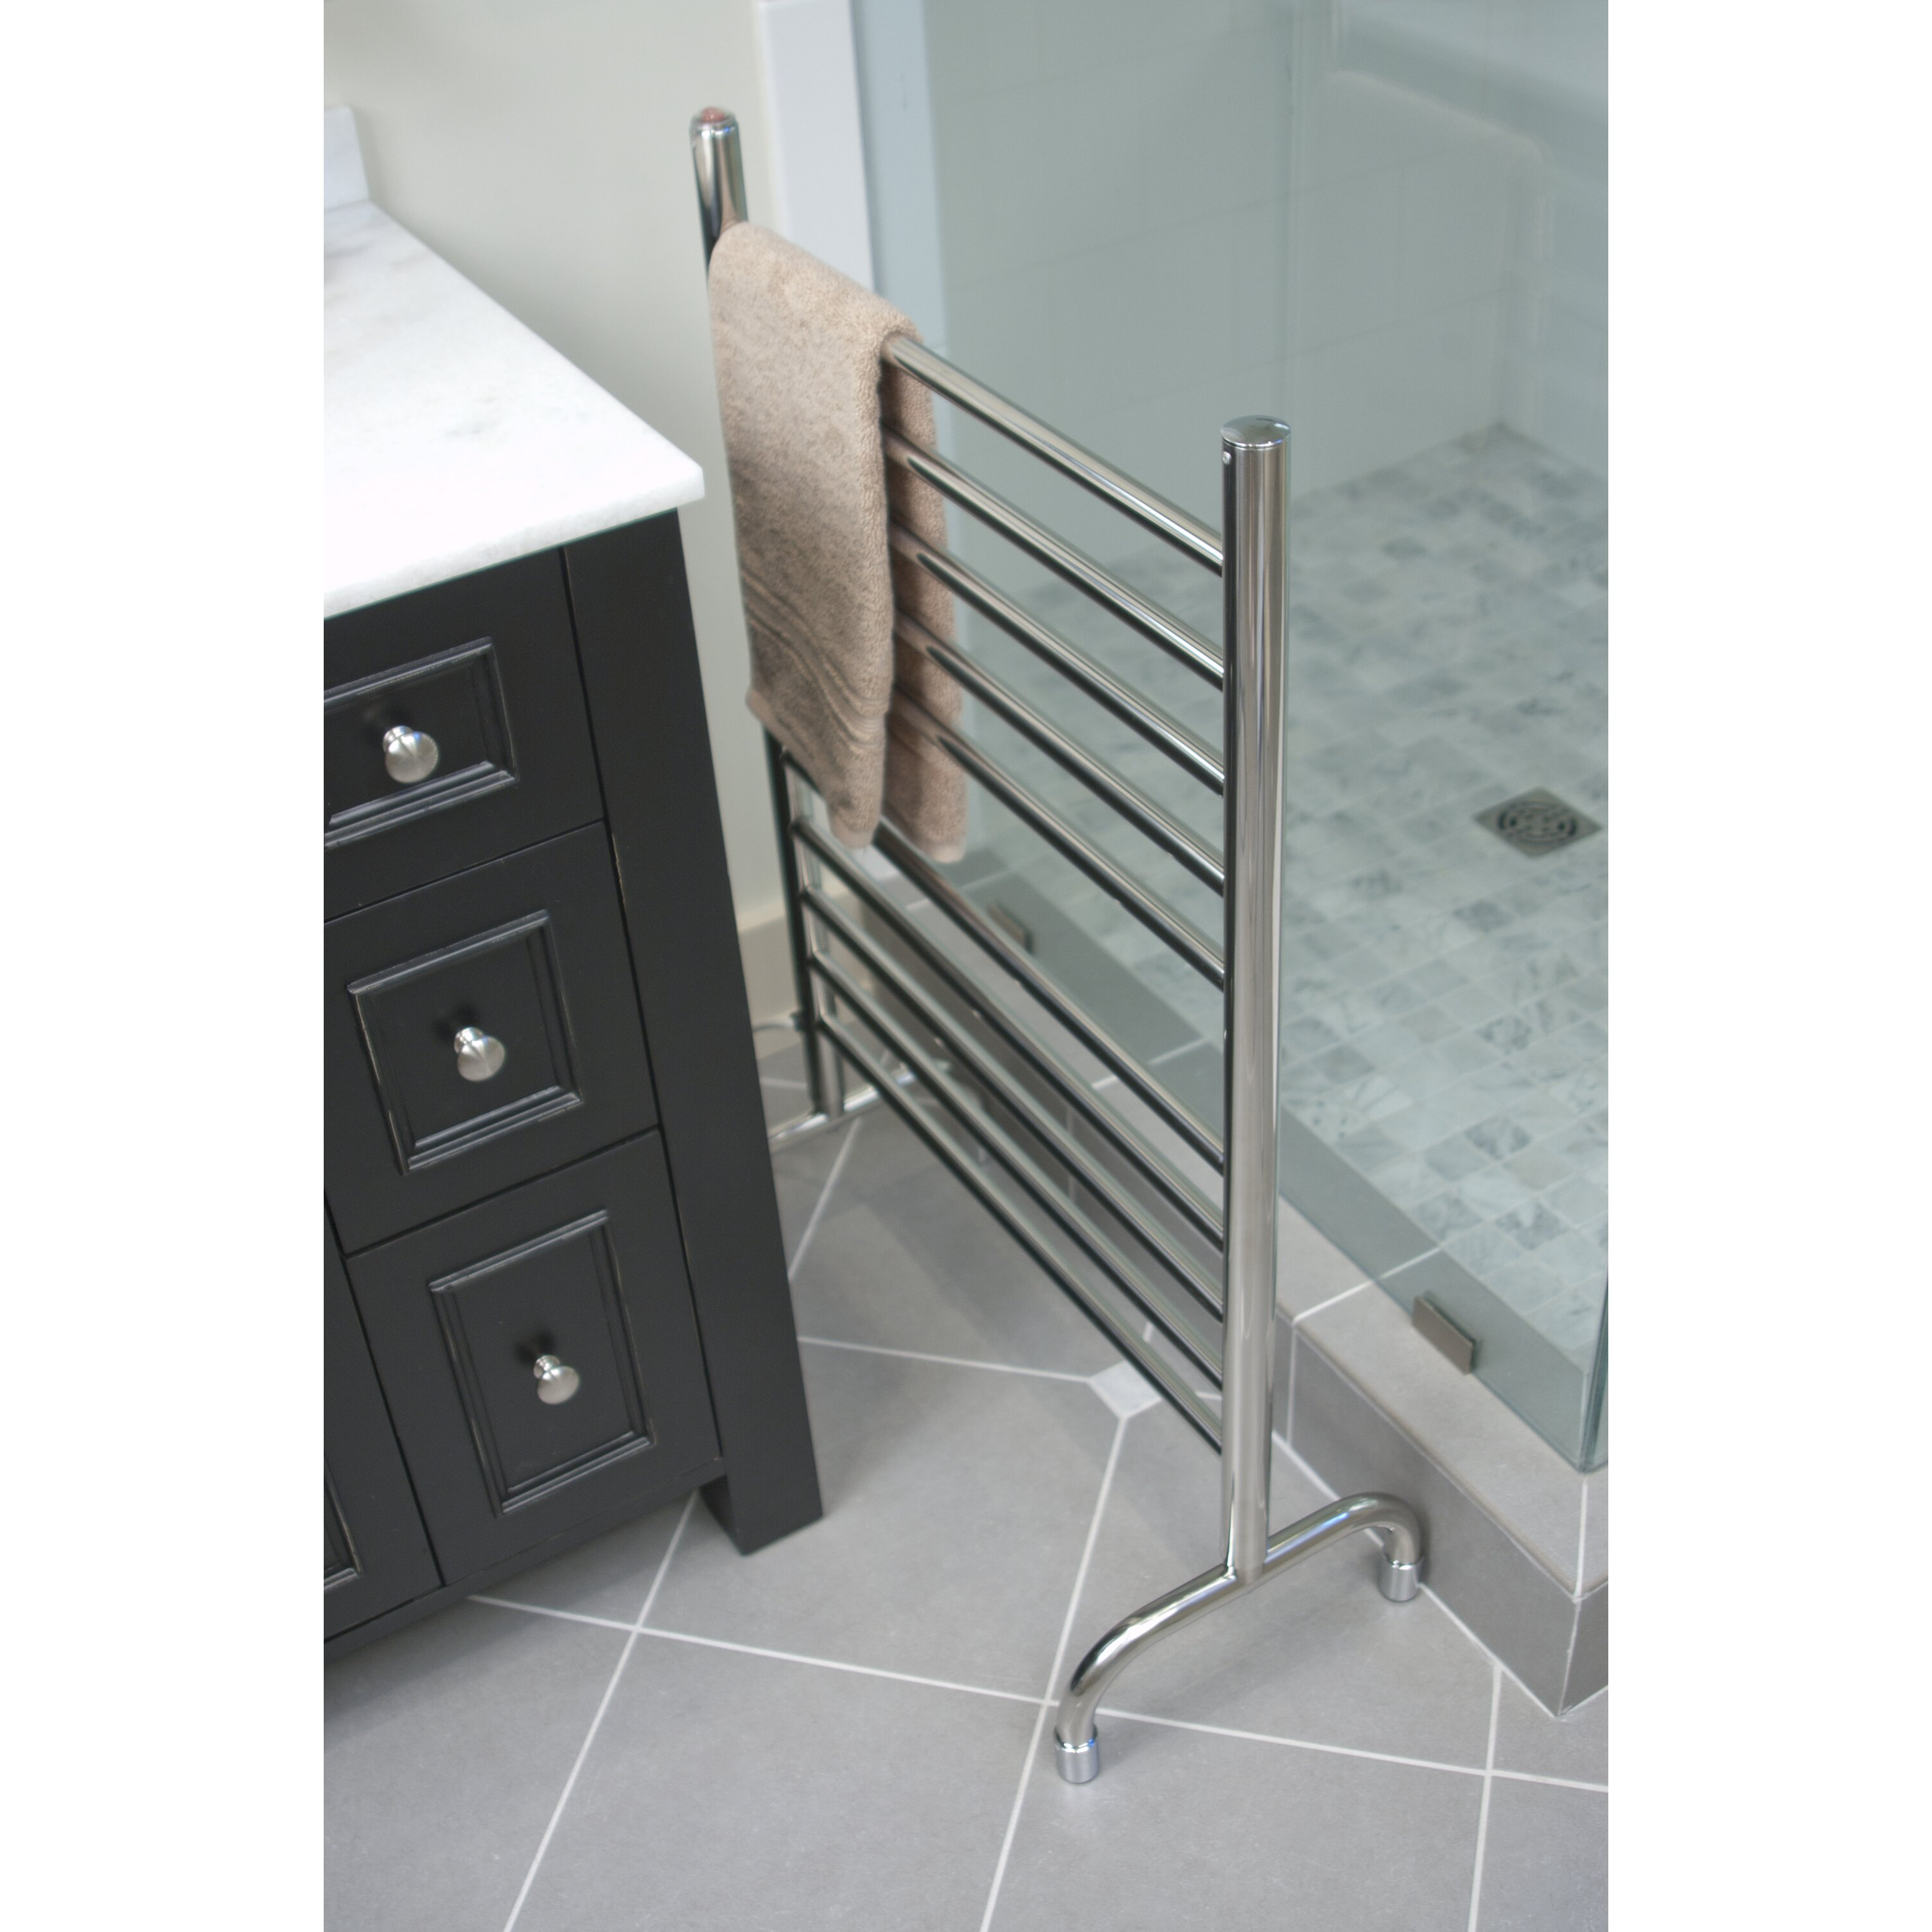 Electric Towel Warmer ~ Amba solo freestanding electric towel warmer reviews